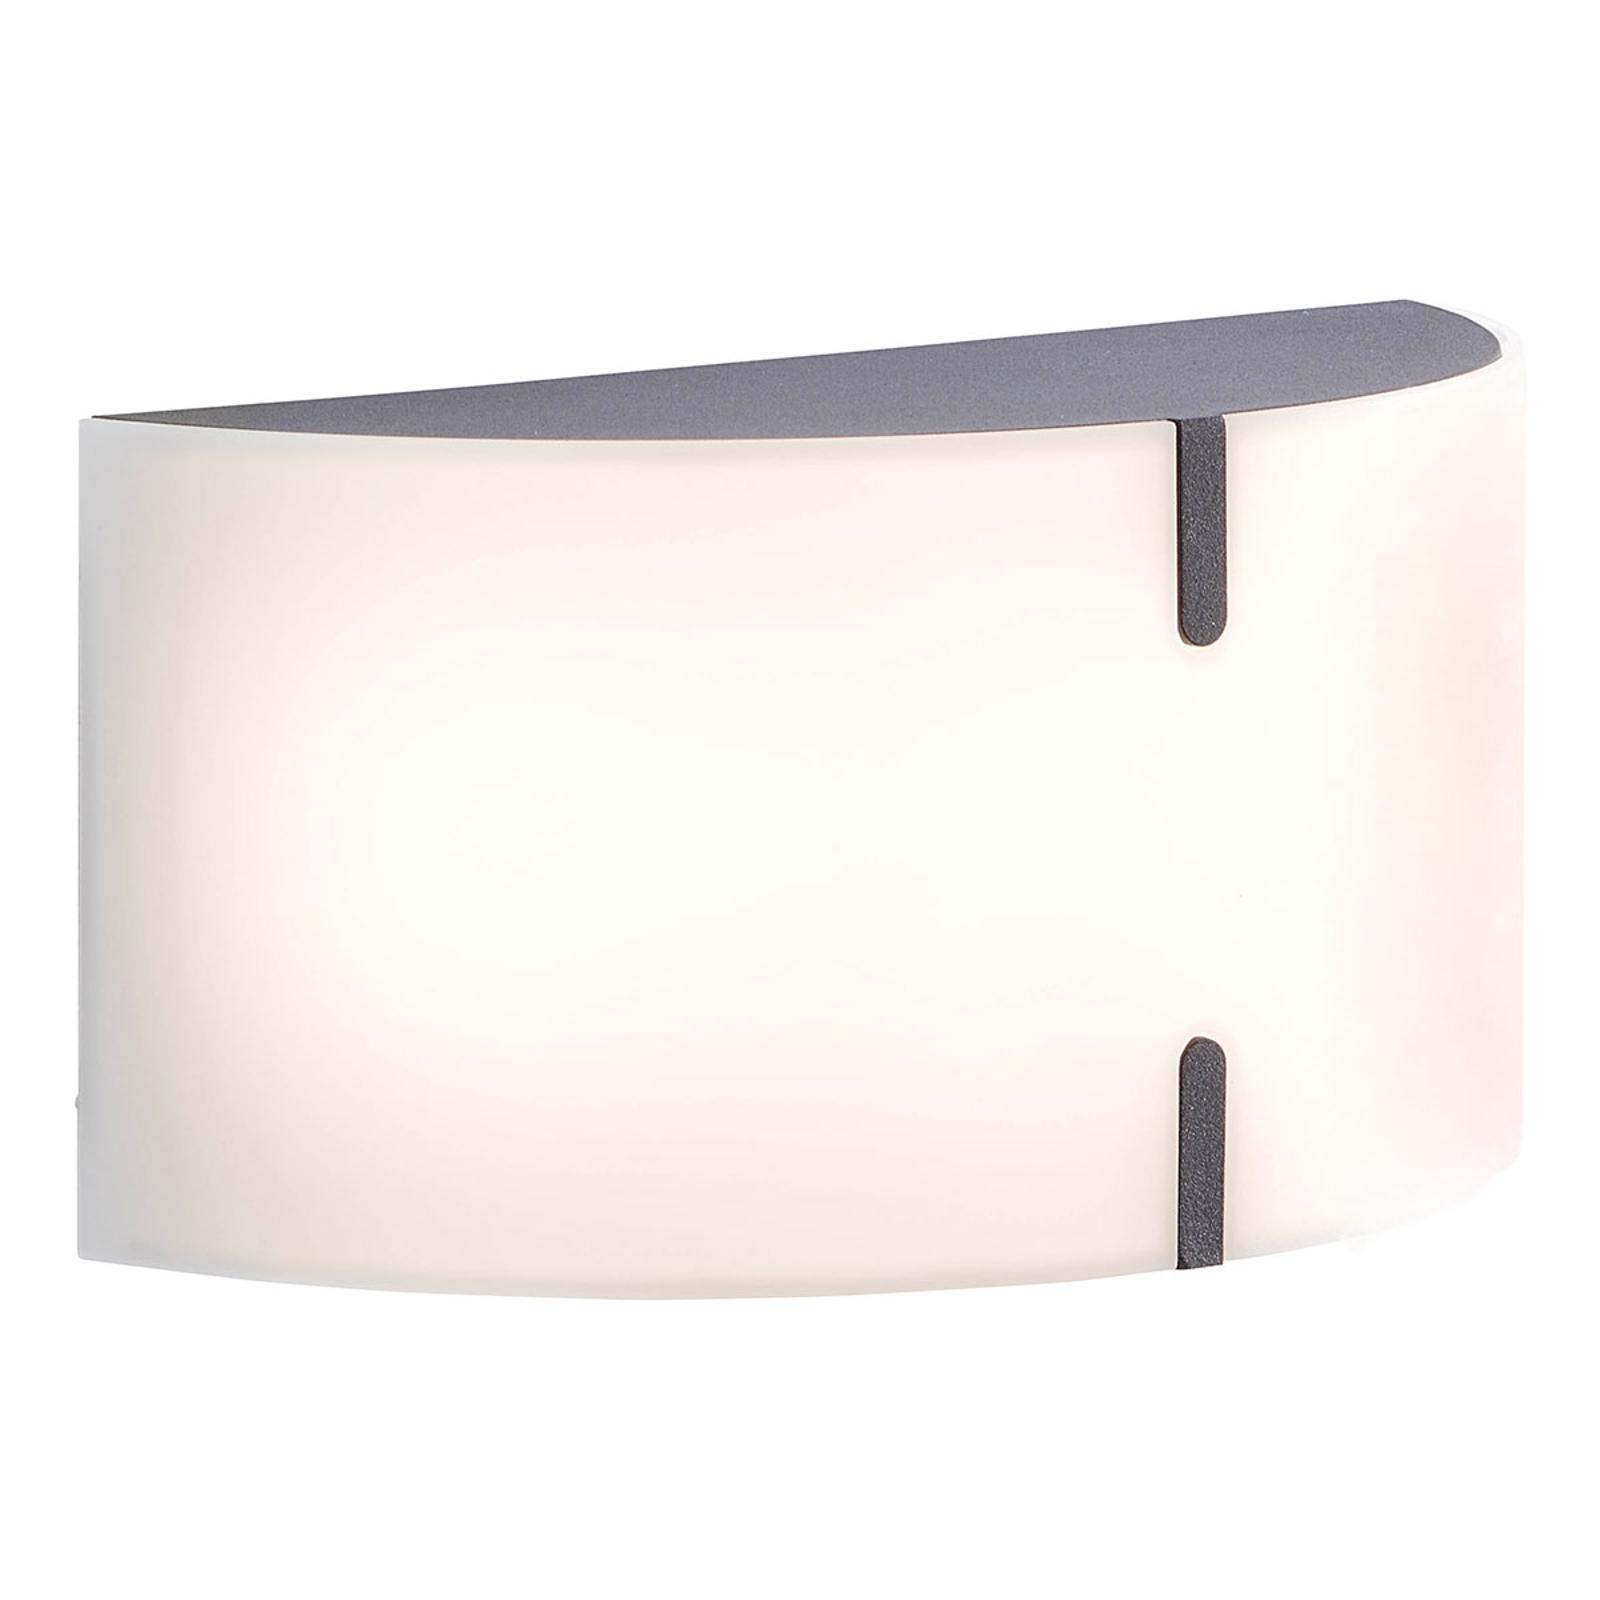 AEG Haily LED-Außenwandleuchte